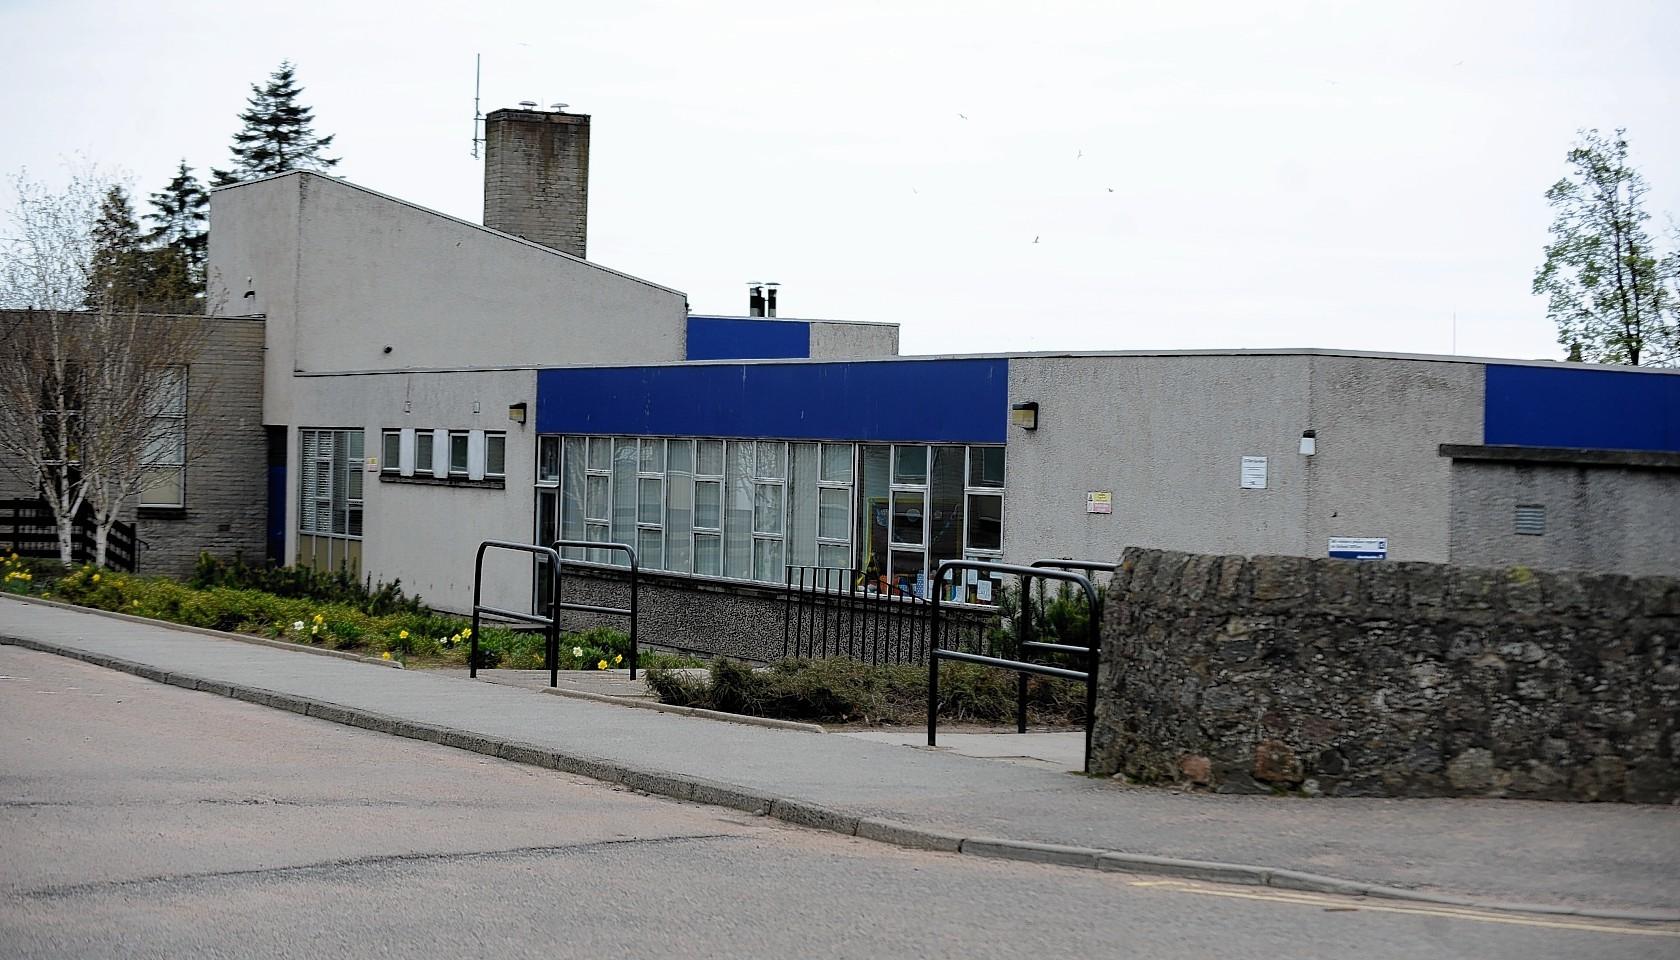 Banchory Primary School